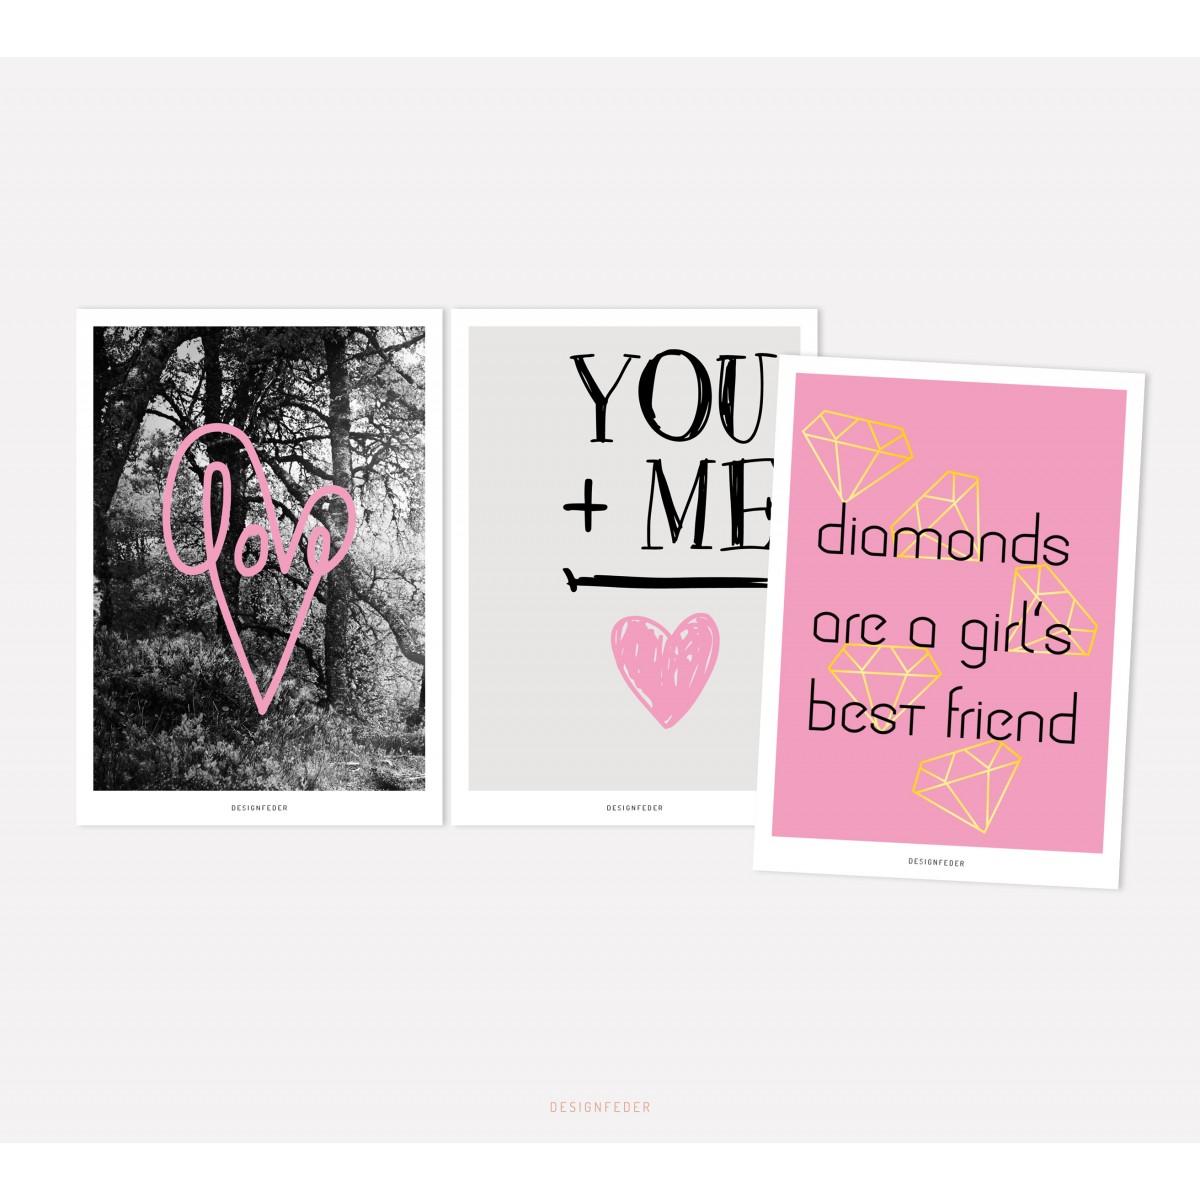 designfeder | Postkarten 3er Set – Love, You + Me und Diamonds